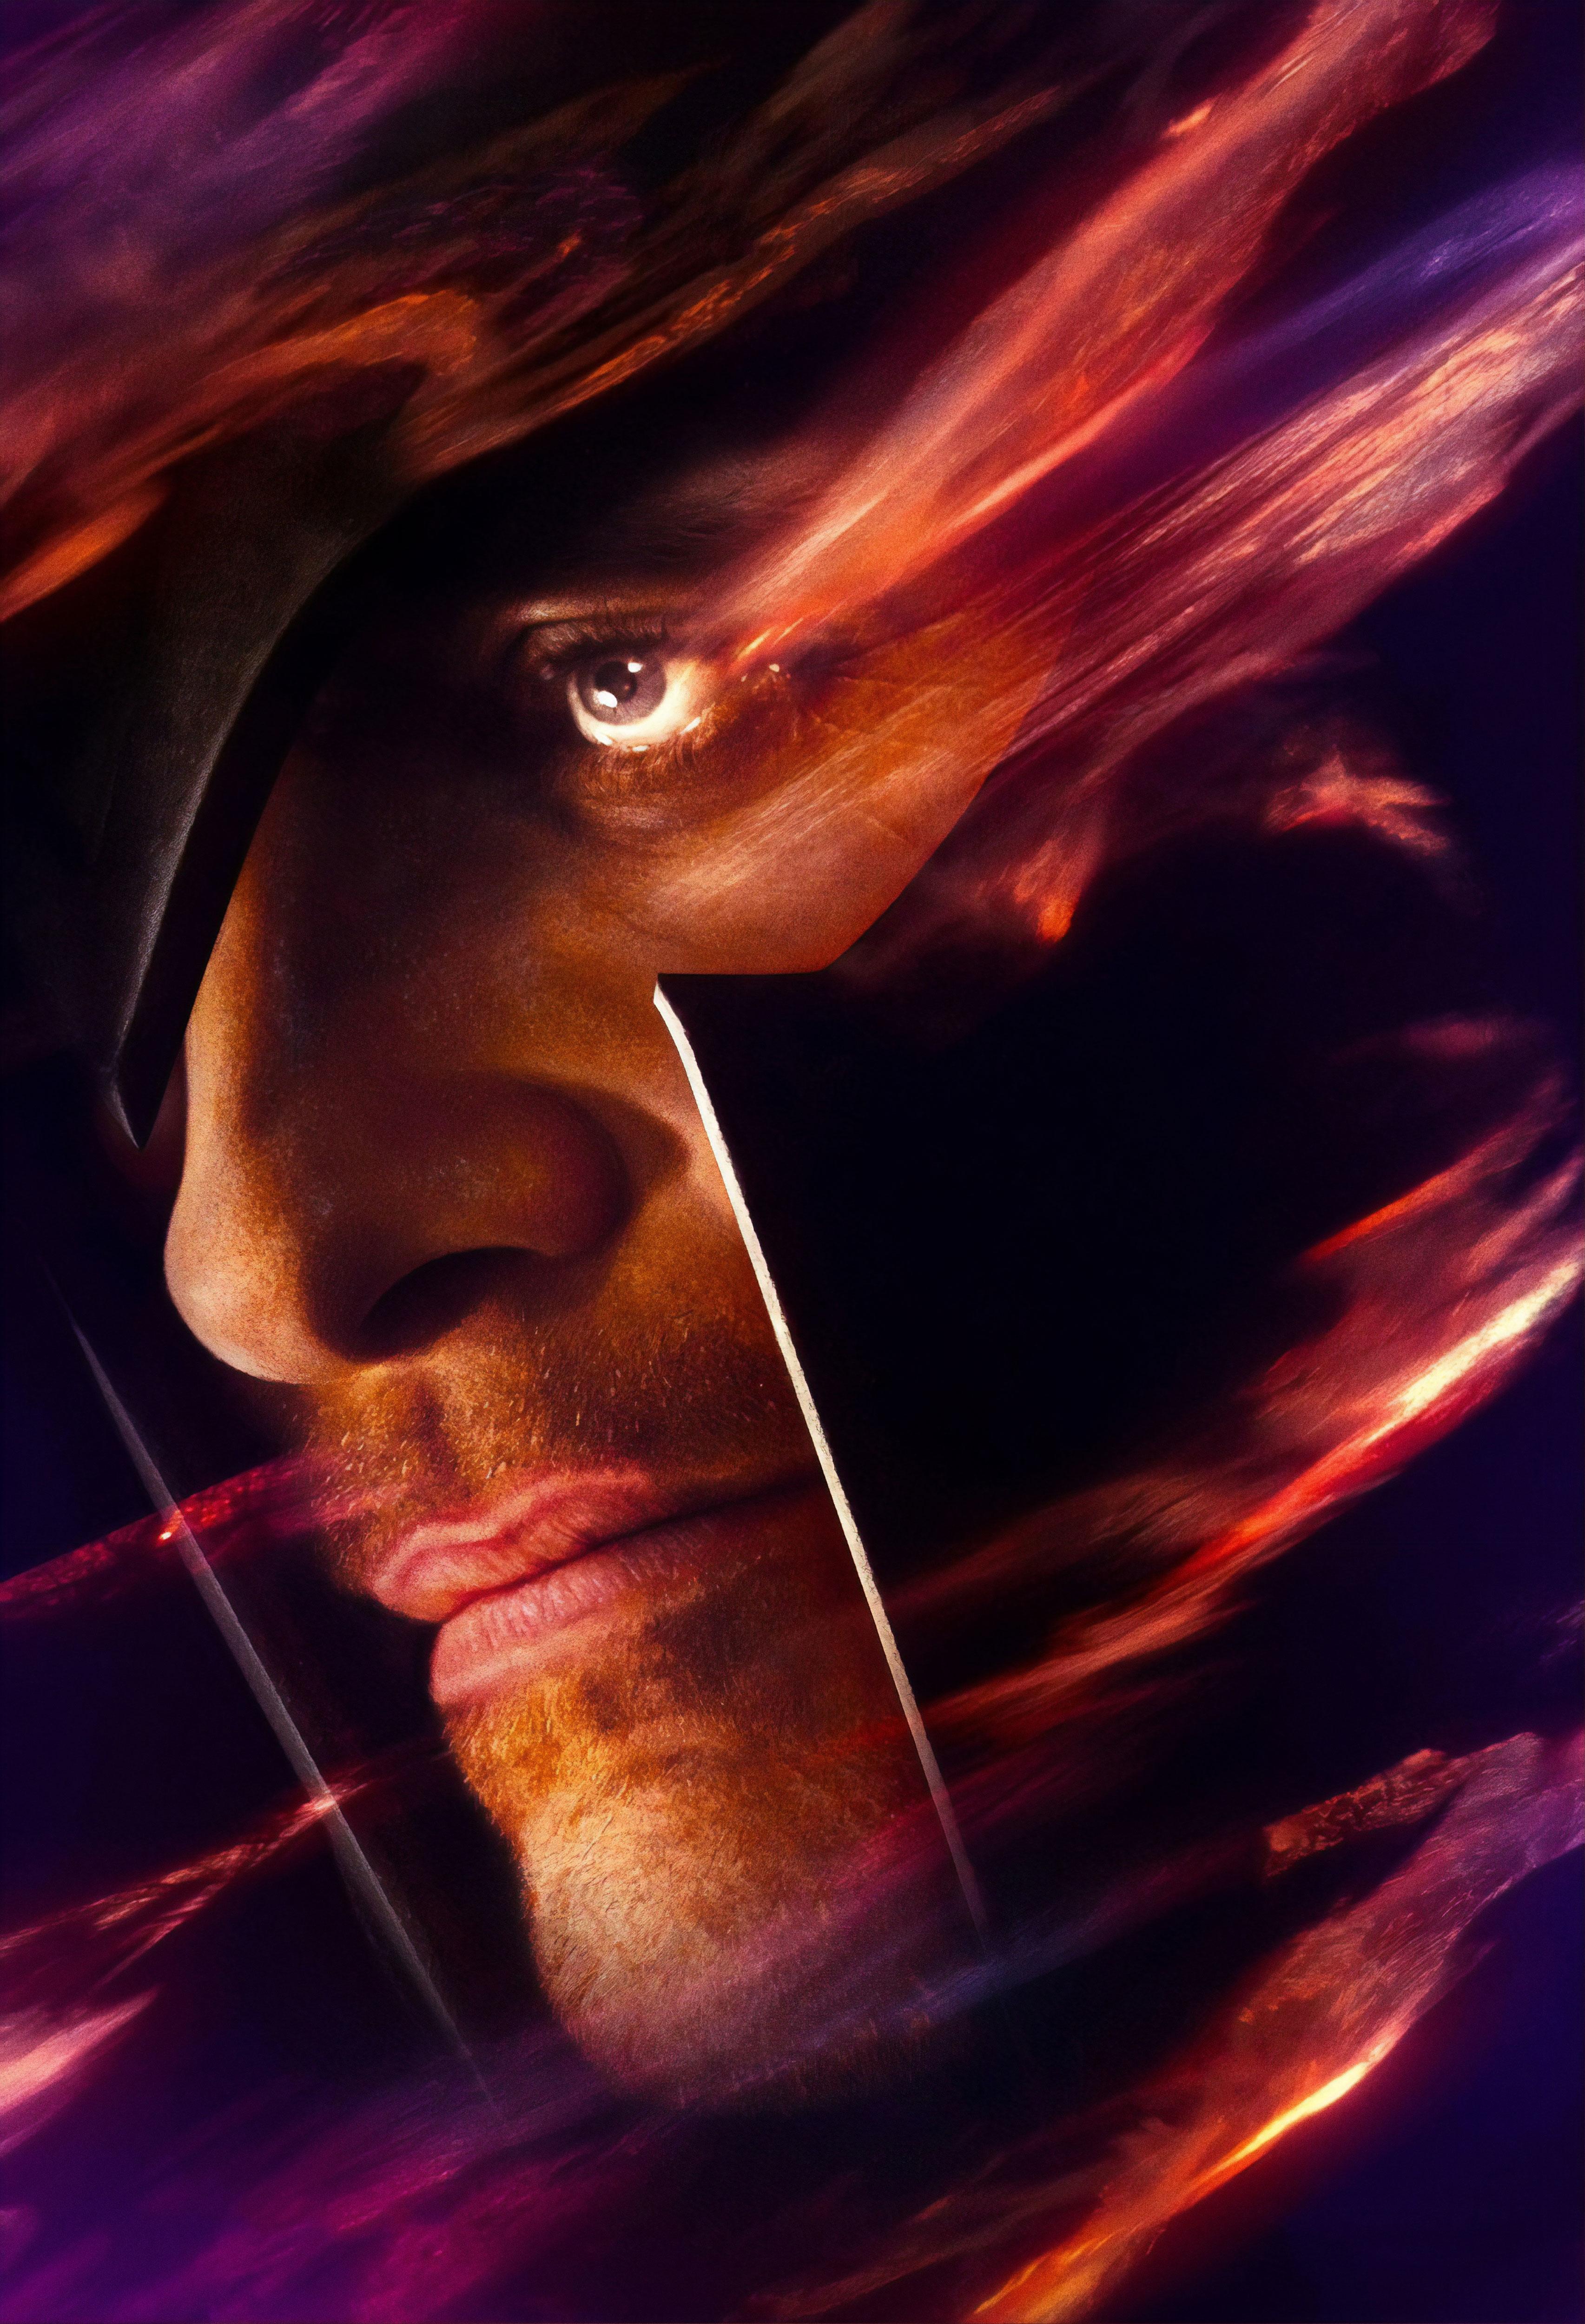 Michael Fassbender As Magneto X Men Dark Phoenix Poster